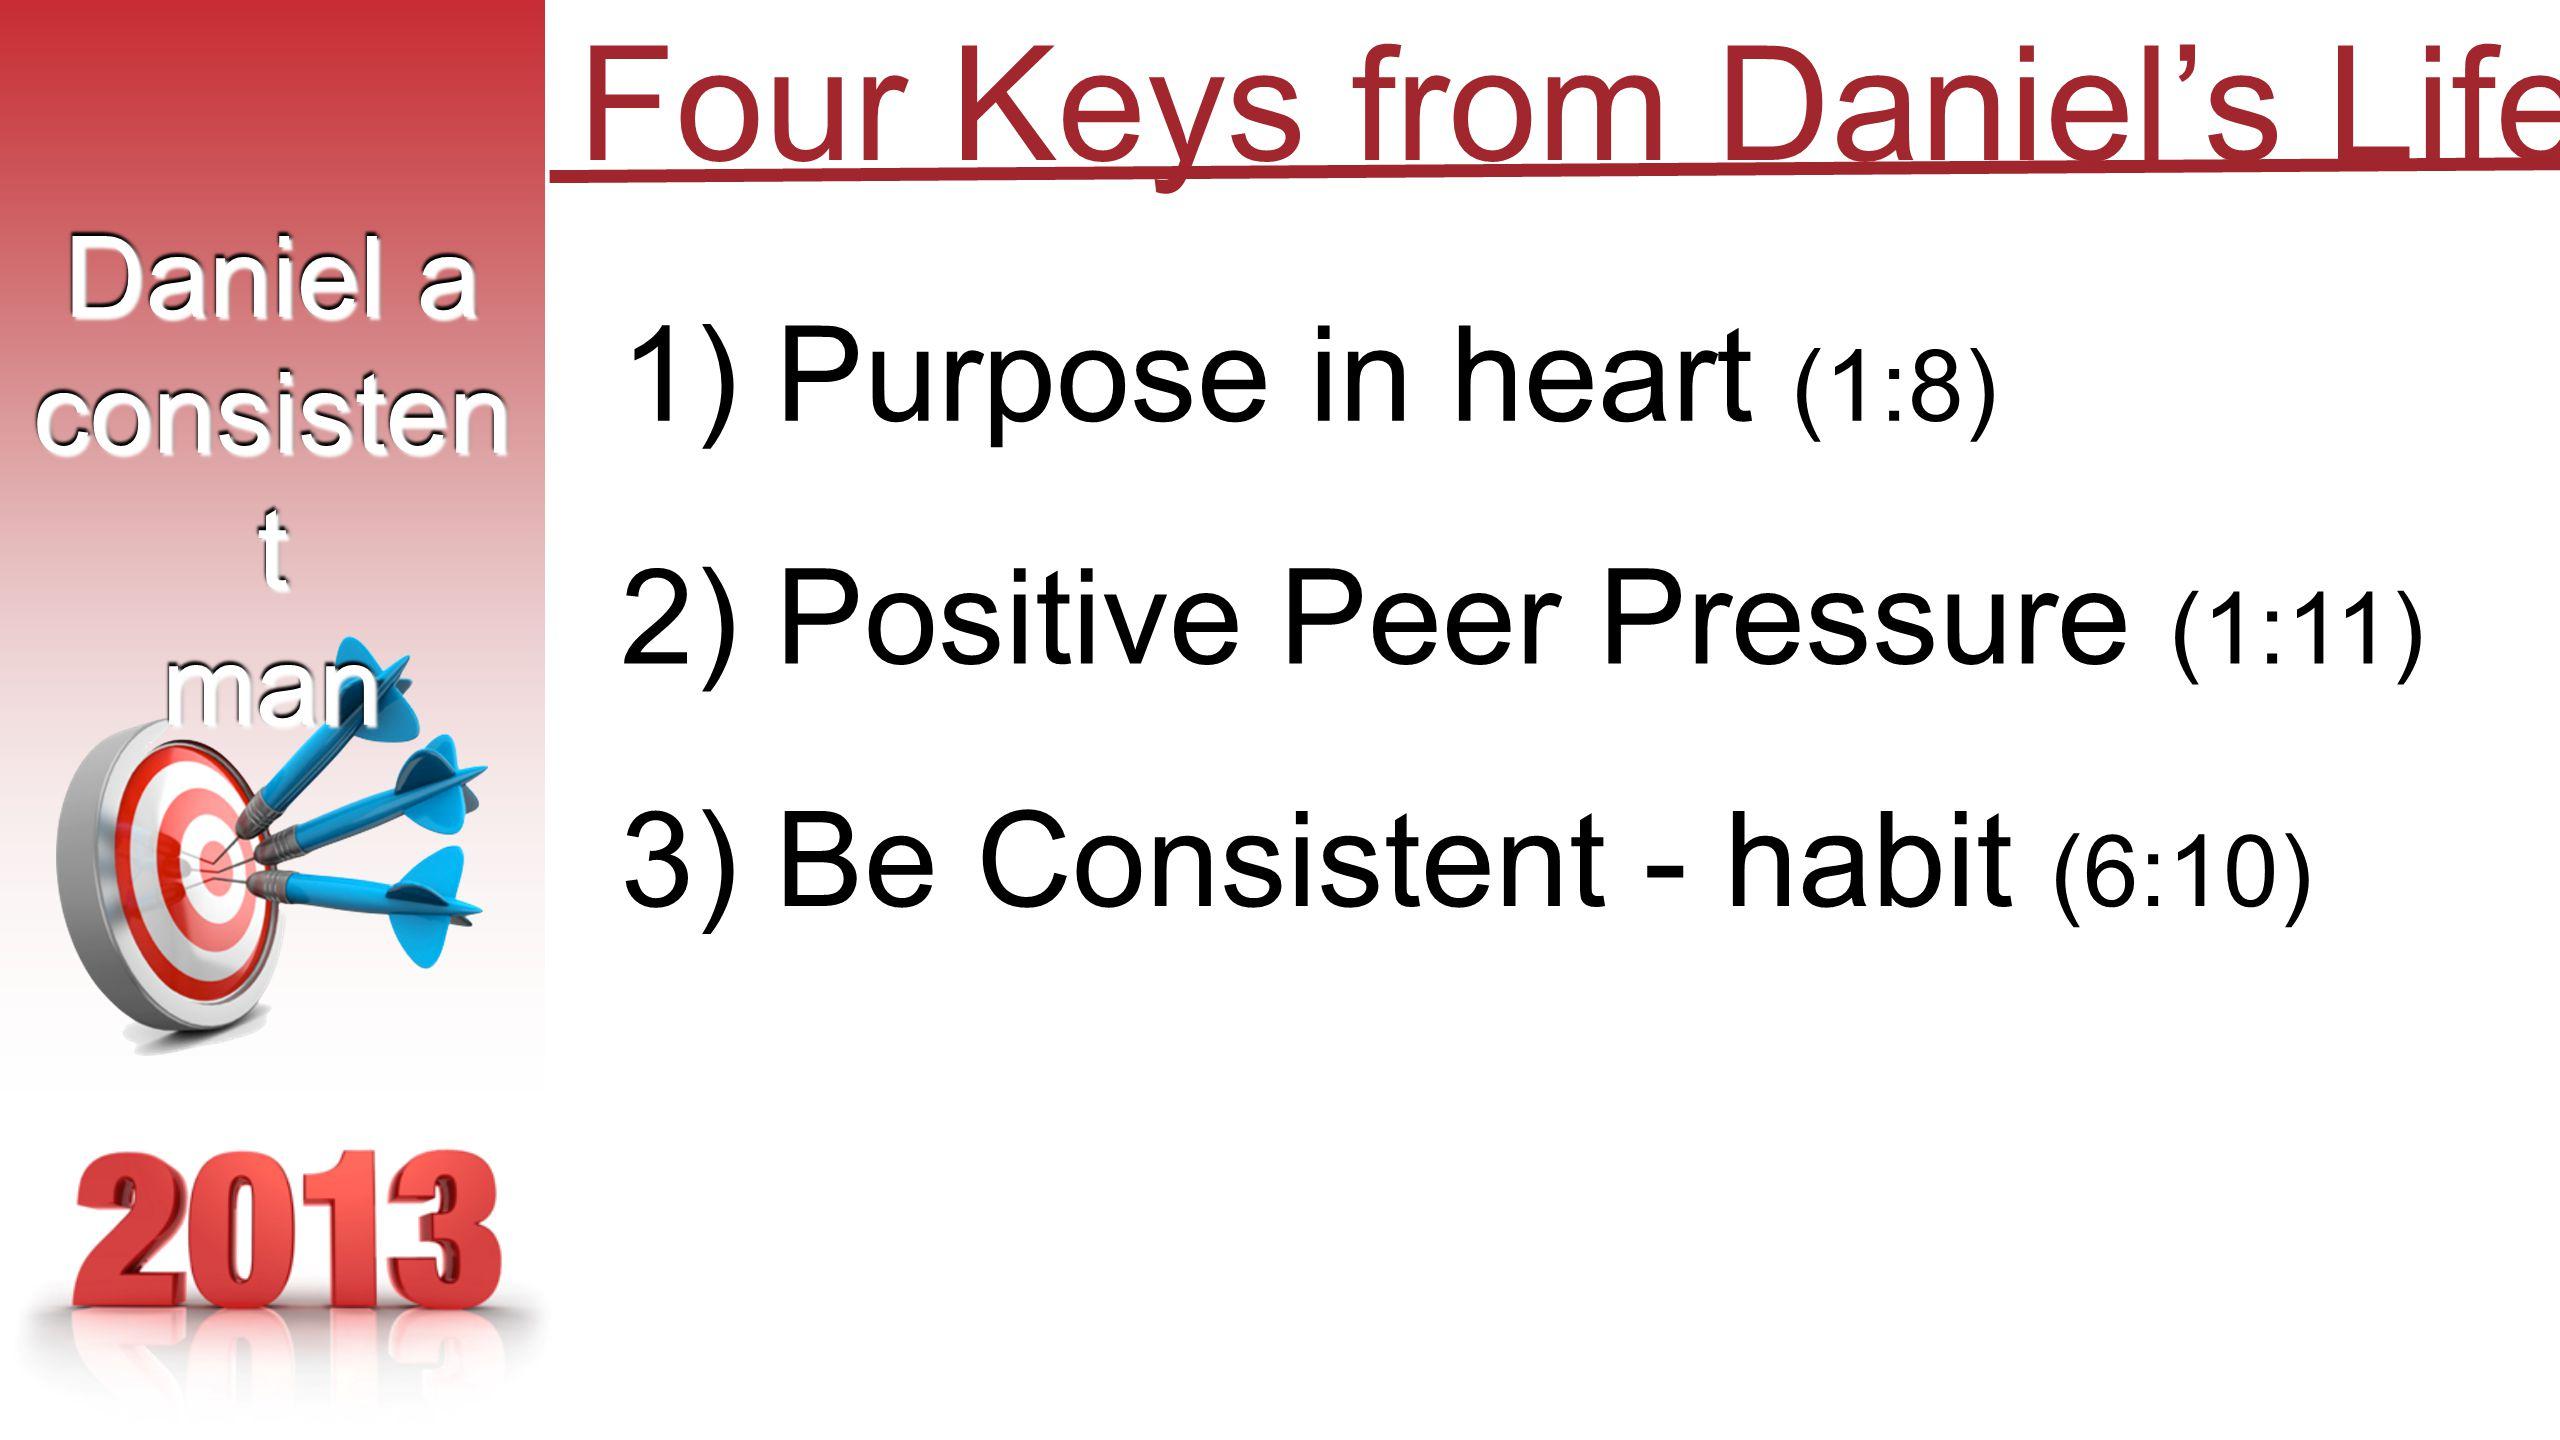 1) Purpose in heart (1:8) 2) Positive Peer Pressure (1:11) 3) Be Consistent - habit (6:10) Daniel a consisten t man Daniel a consisten t man Four Keys from Daniel's Life